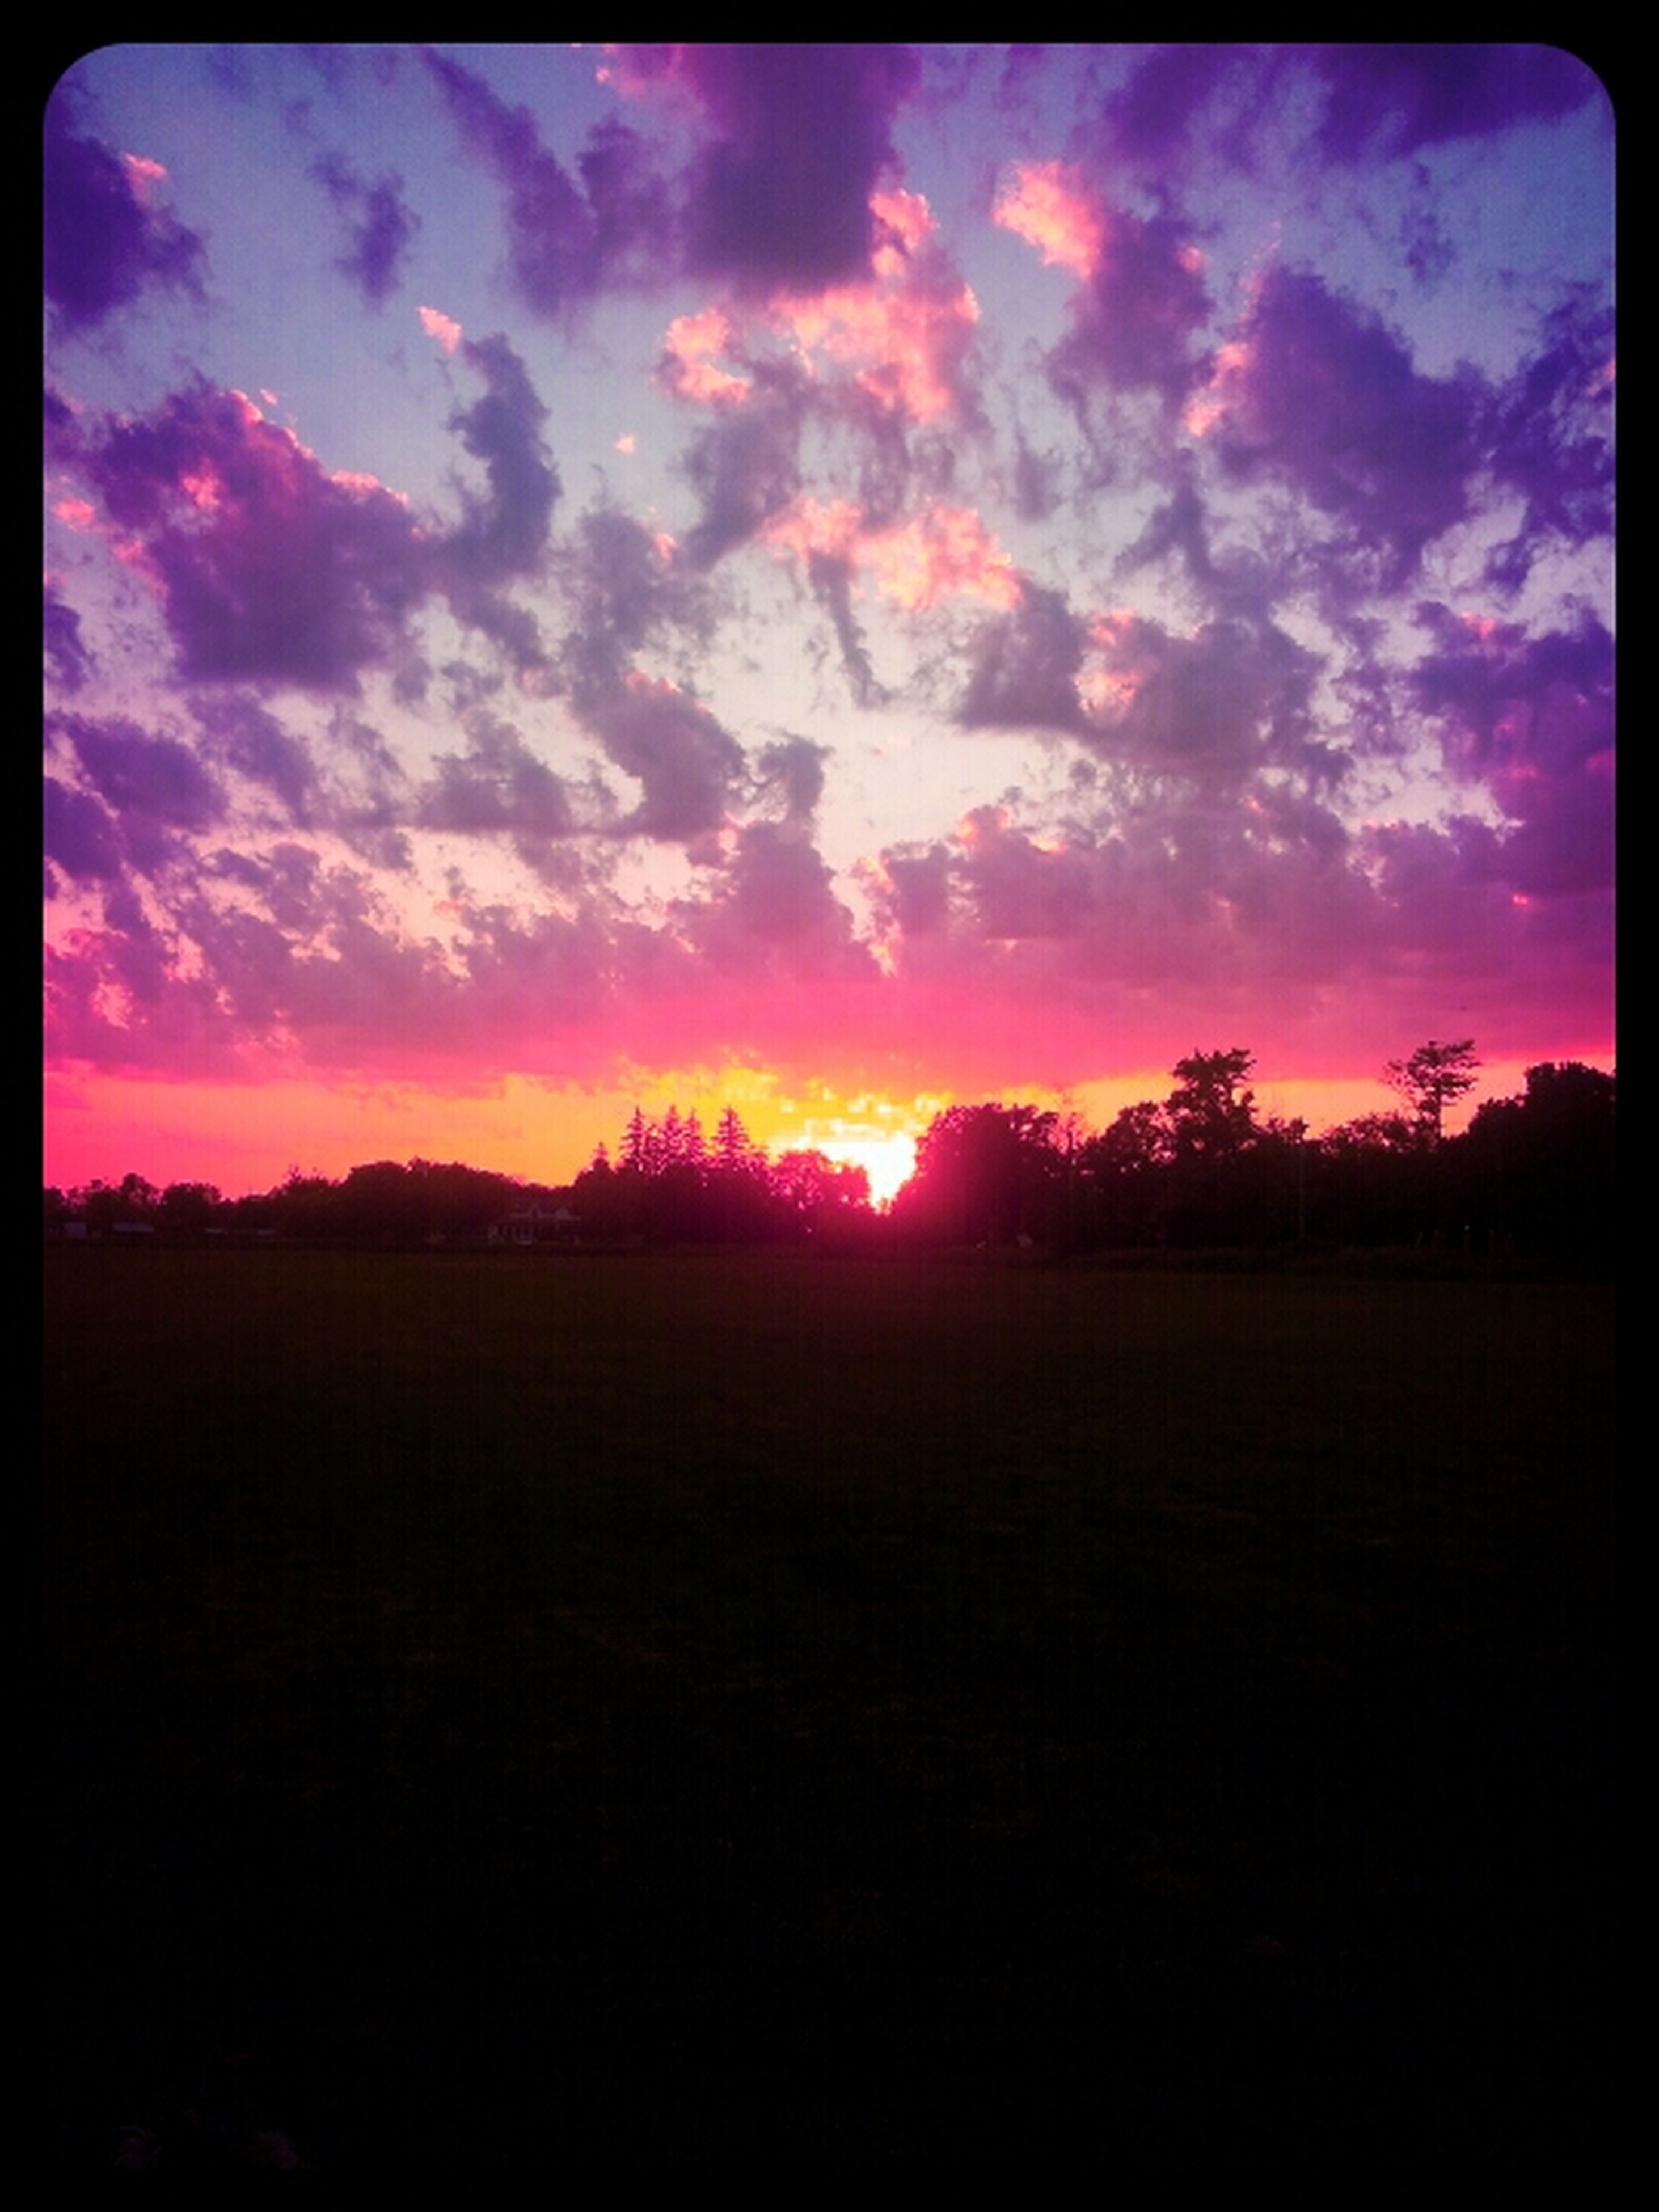 sunset, tranquil scene, scenics, tranquility, silhouette, sky, beauty in nature, landscape, sun, orange color, transfer print, nature, cloud - sky, idyllic, field, cloud, sunlight, auto post production filter, dramatic sky, horizon over land